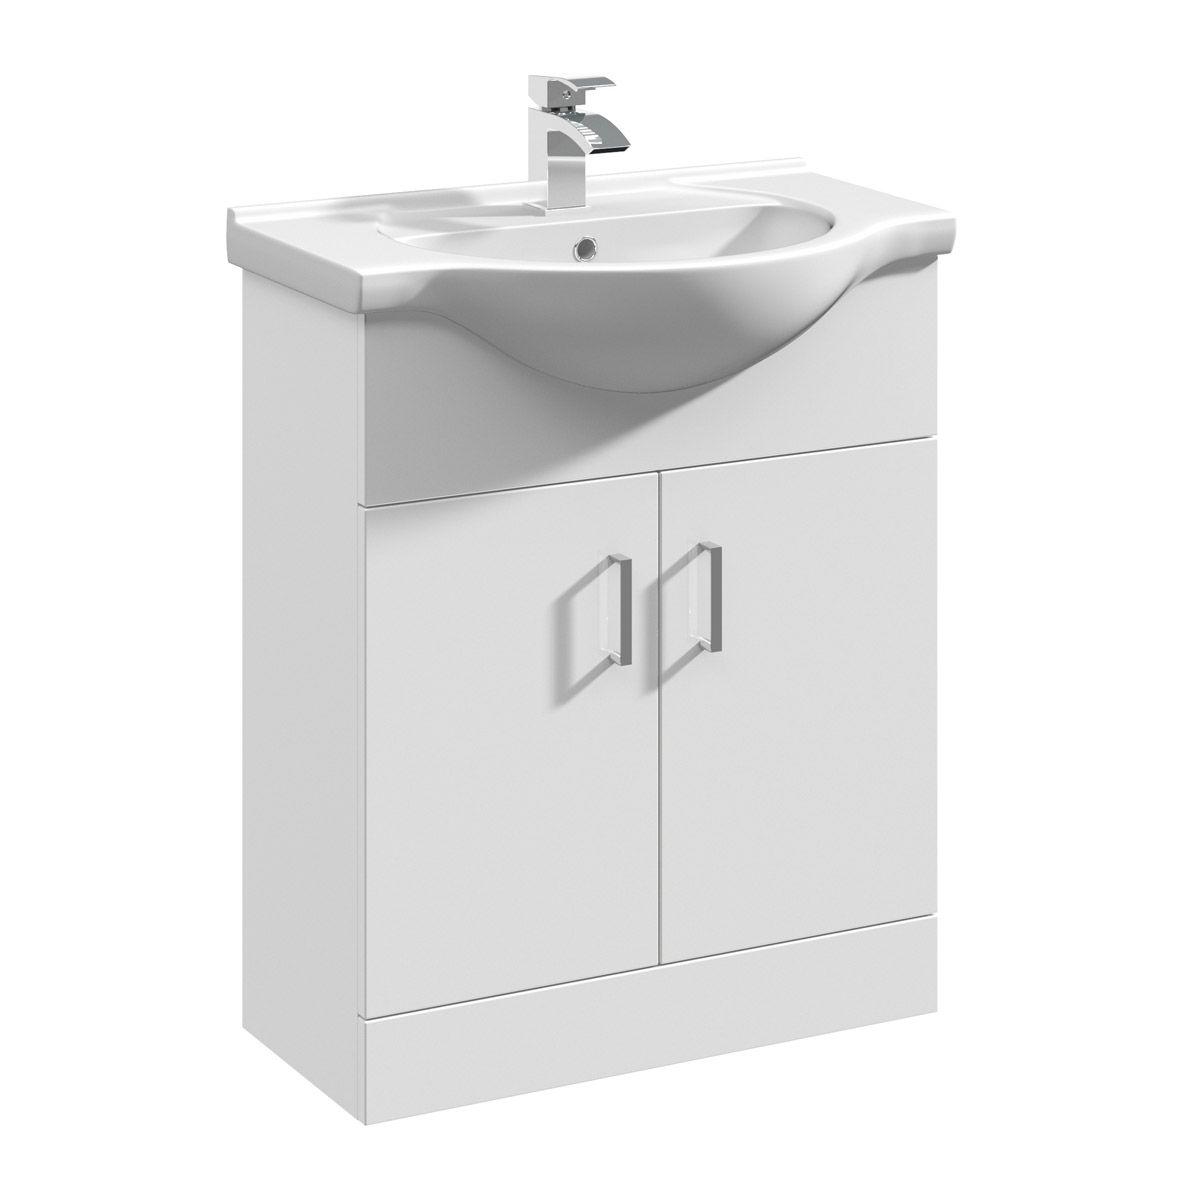 Premier High Gloss White Vanity Unit 650mm